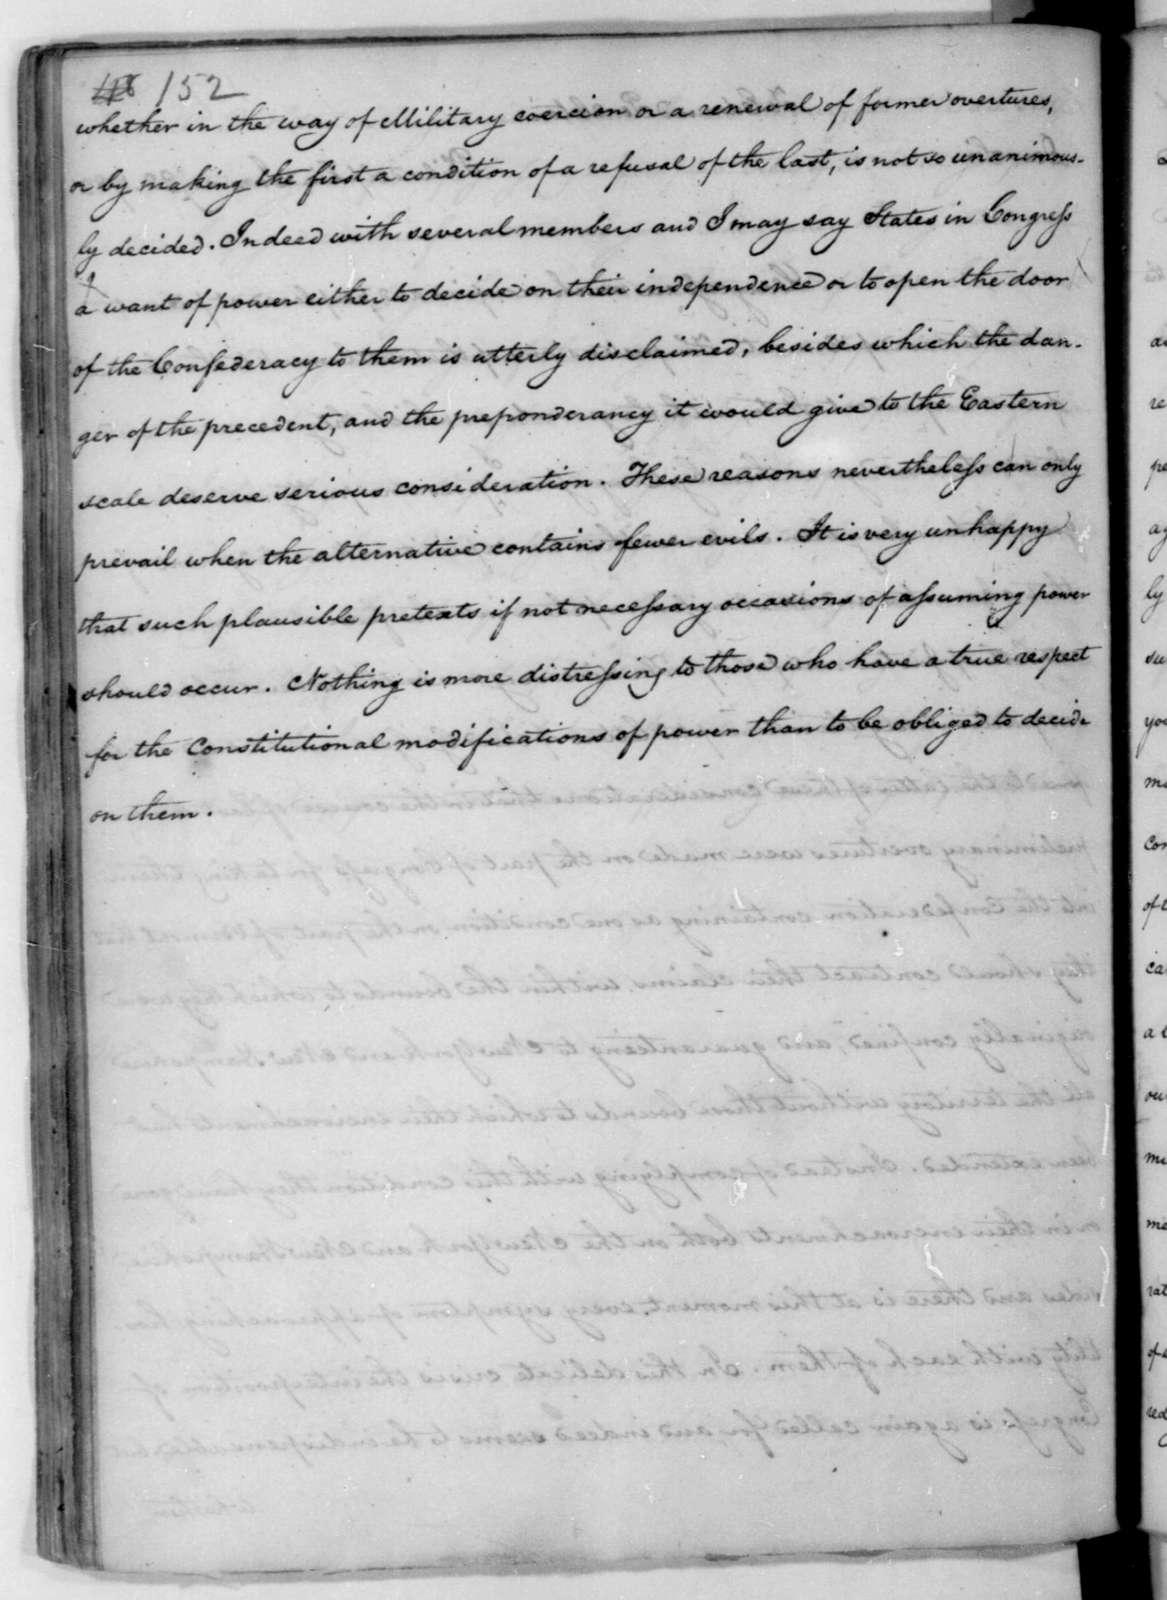 James Madison to Edmund Pendleton, January 22, 1782.